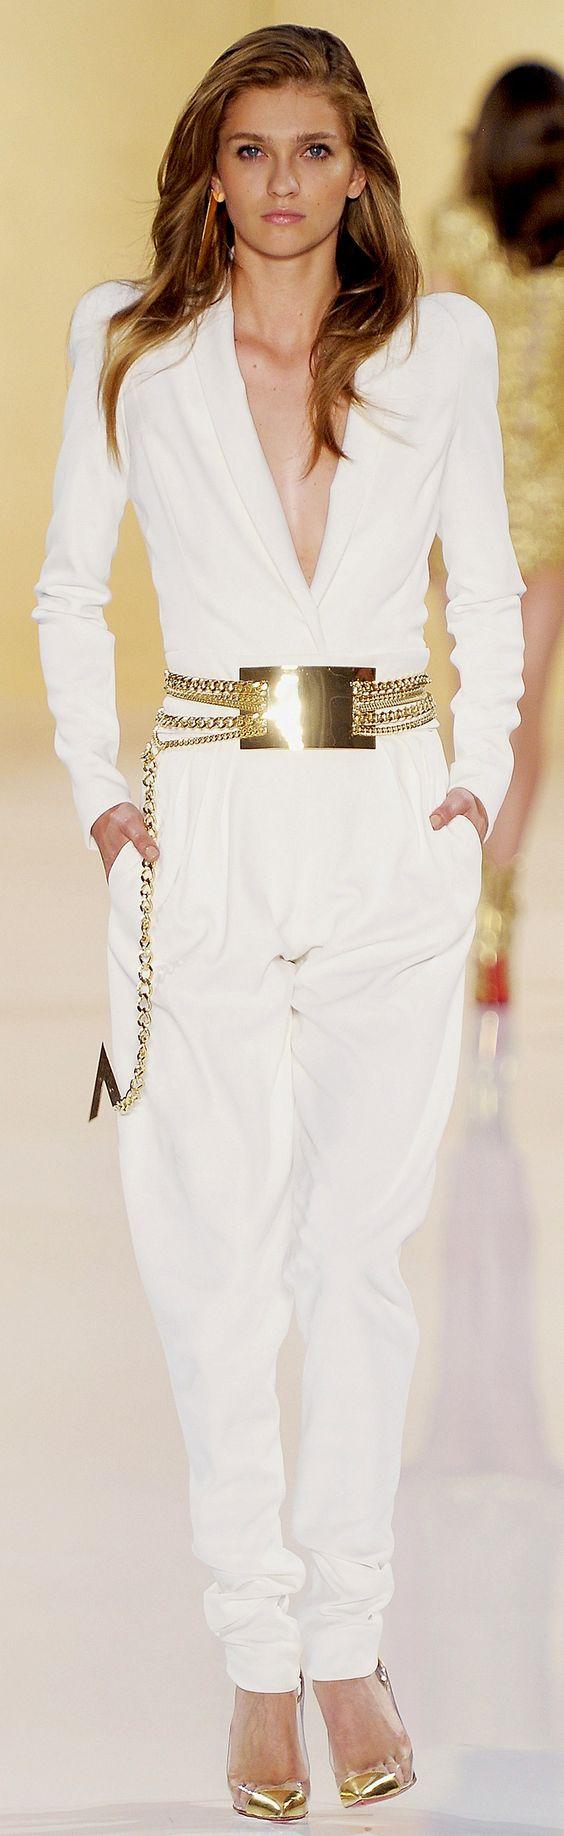 Alexandre Vautier Haute Couture FW 2013: